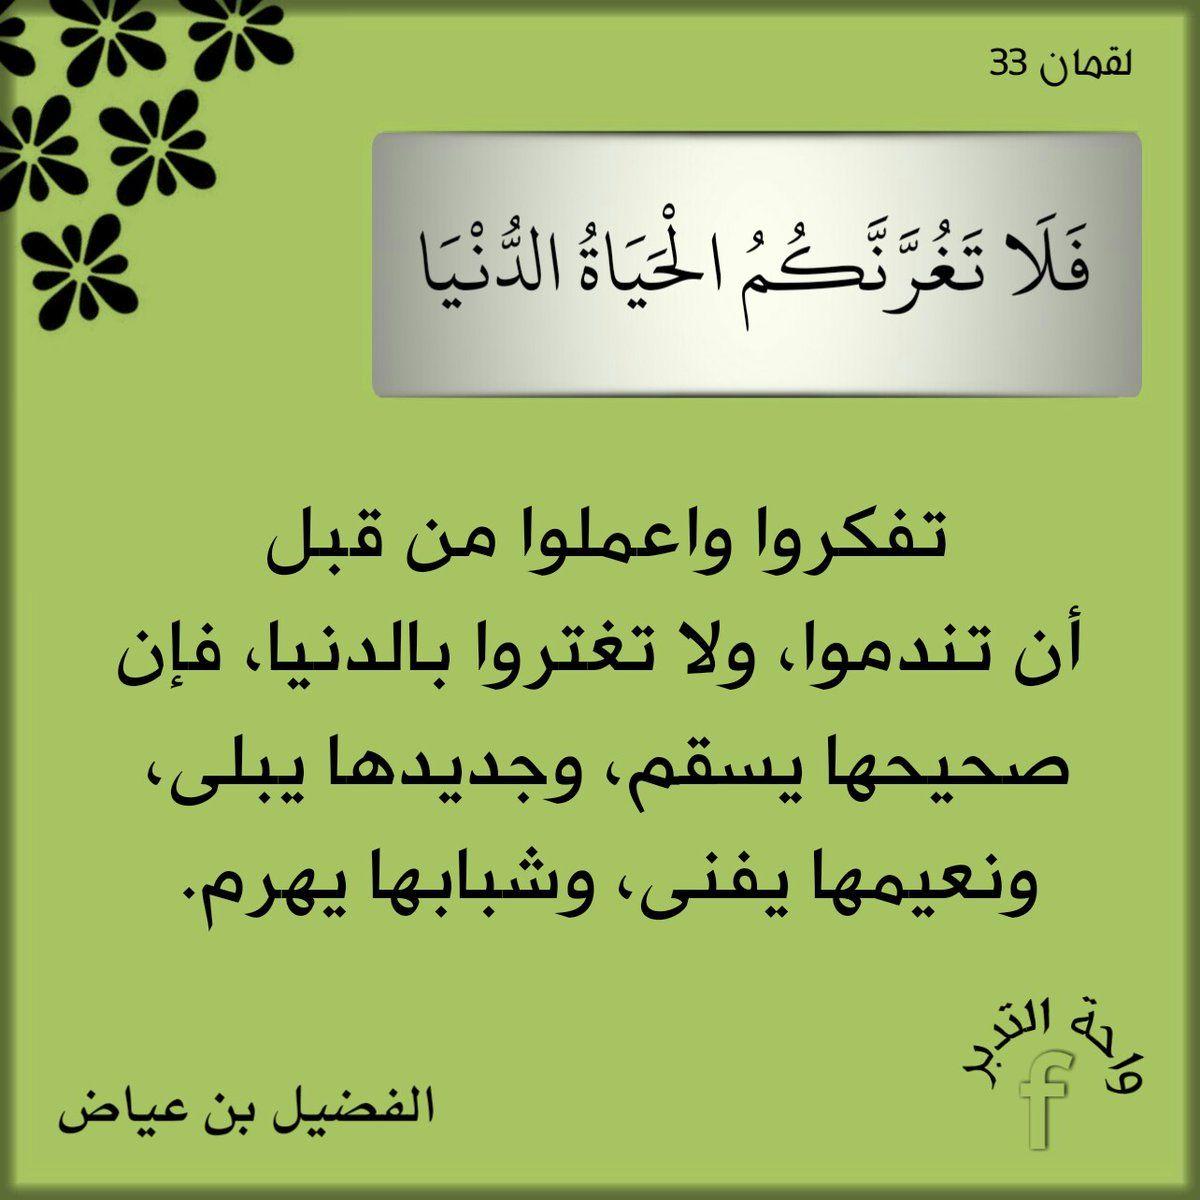 Pin By I Love You Iskander On The Noble Quran القرآن الكريم Math Math Equations